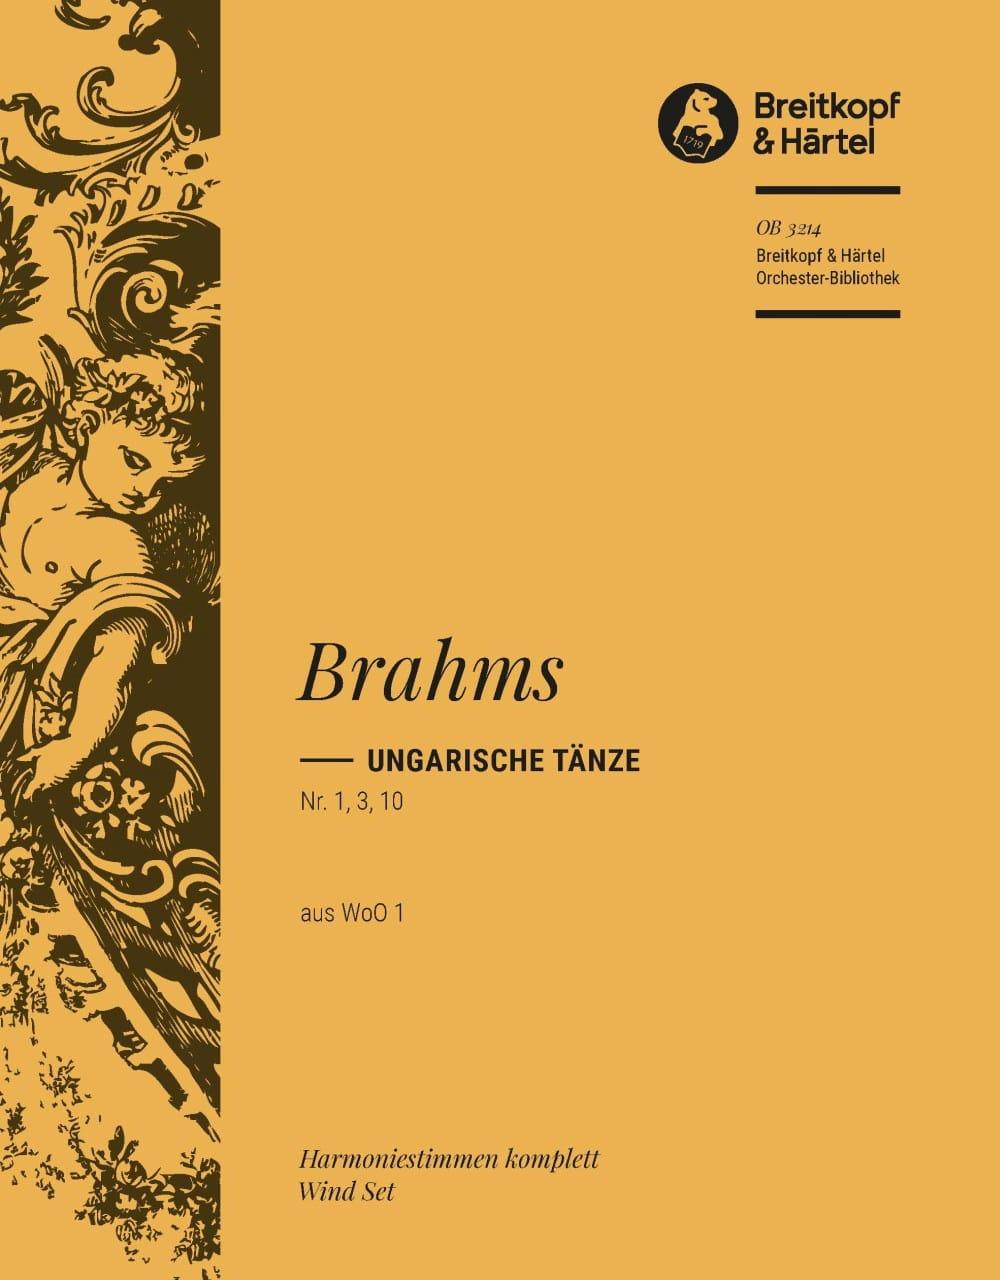 Ungarische Tänze, Nr. 1, 3, 10 - BRAHMS - Partition - laflutedepan.com